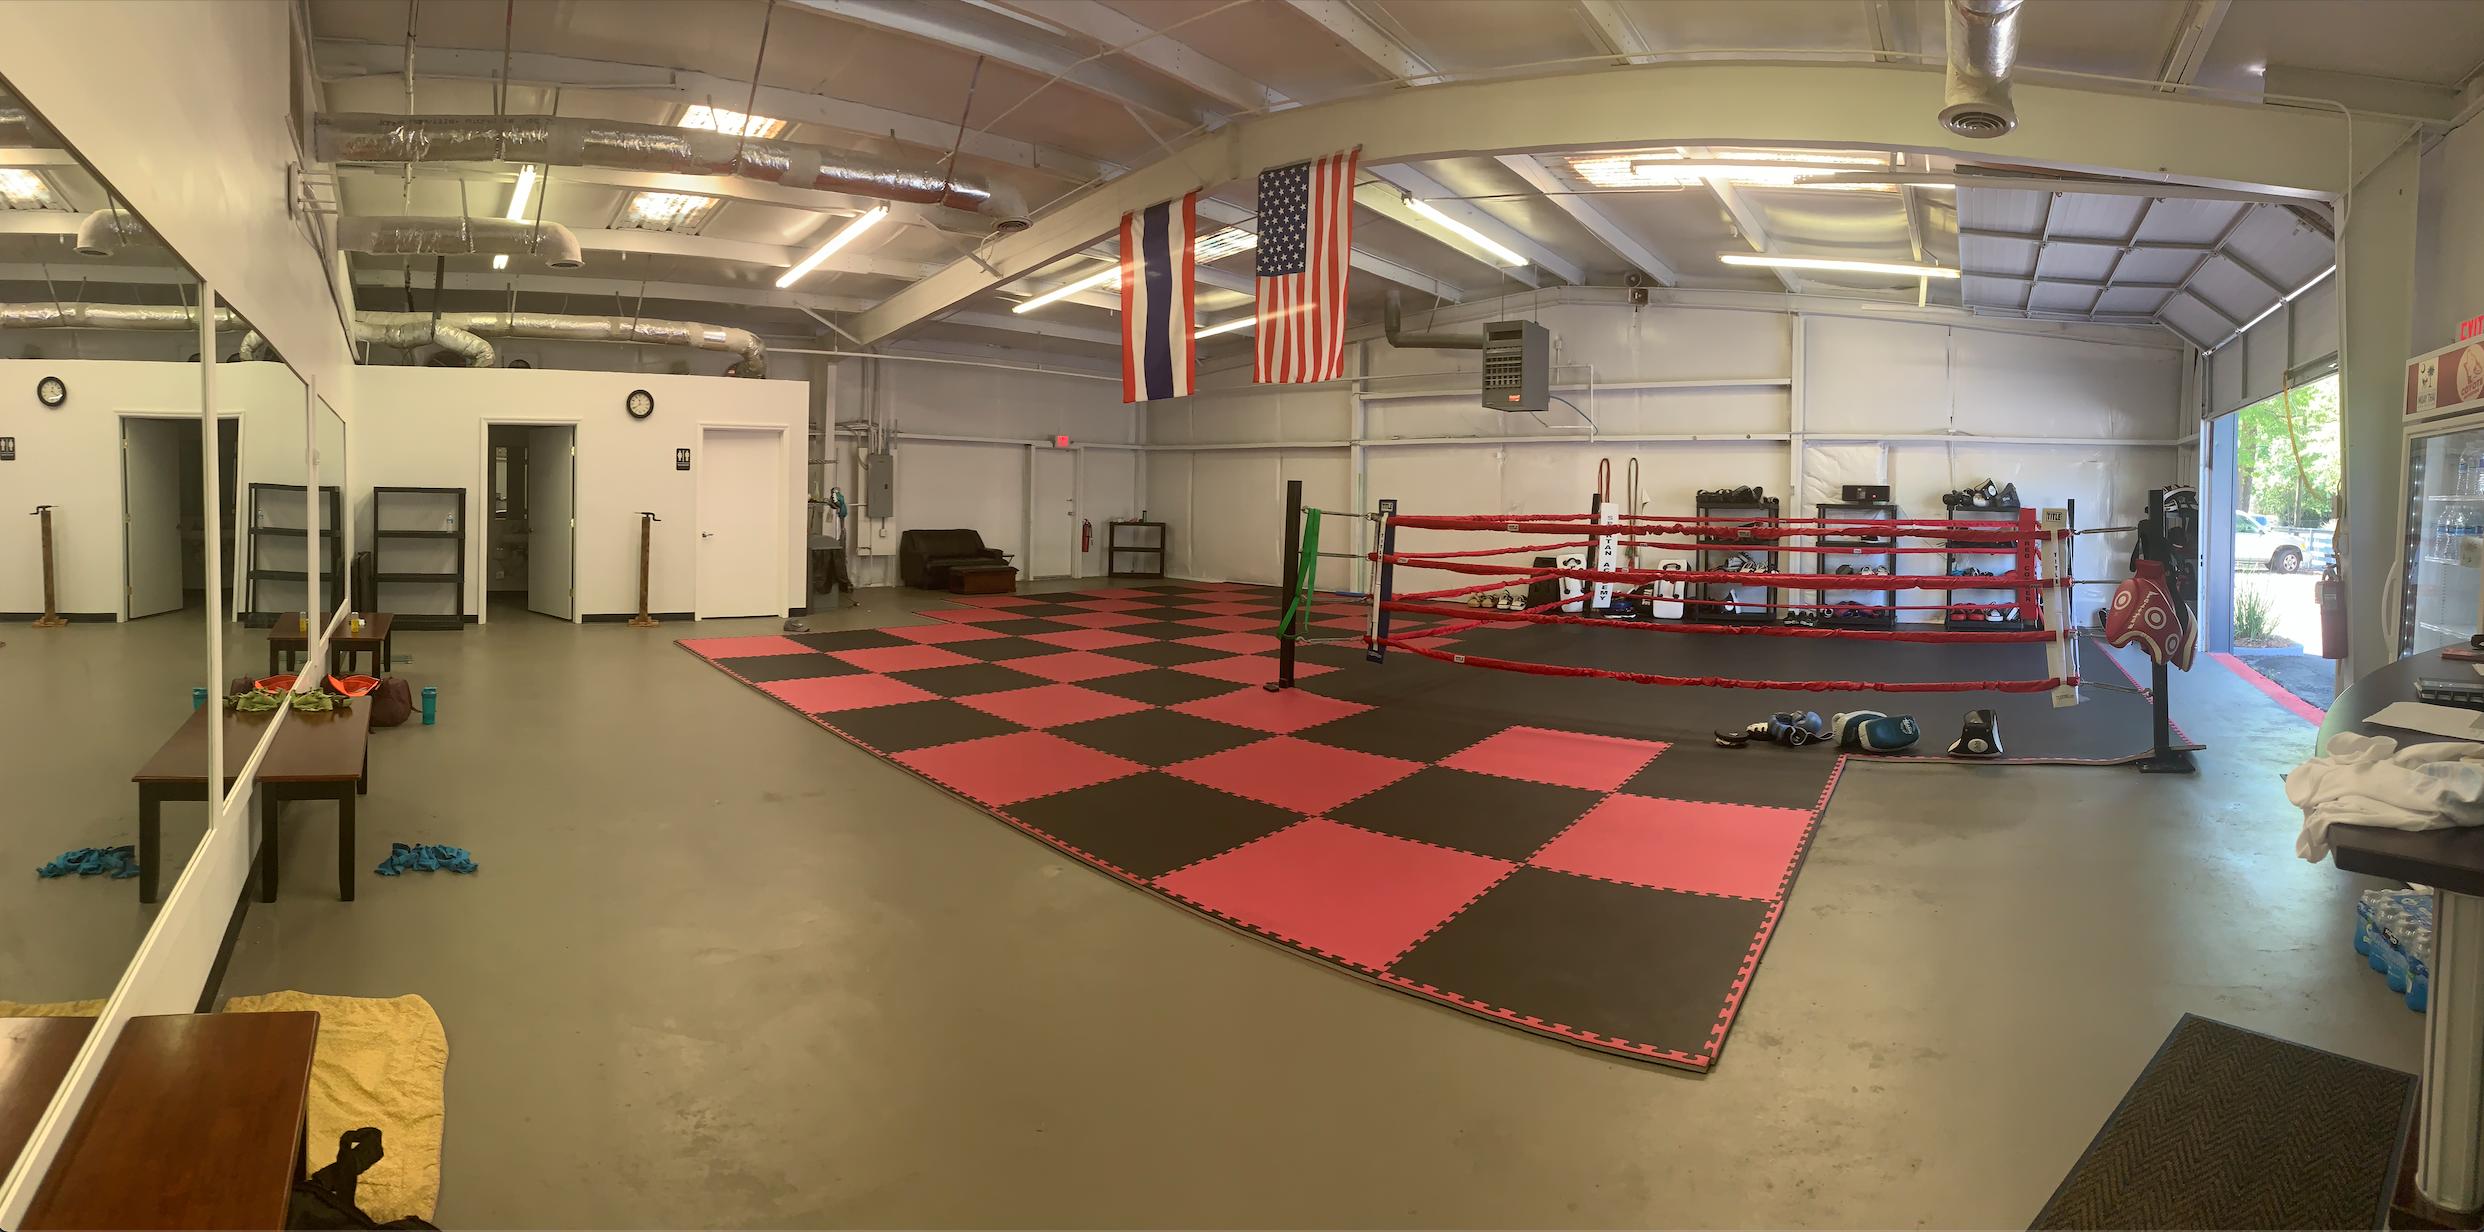 inside Charleston Muay Thai & Boxing - 1856 Belgrade Ave, Charleston, SC